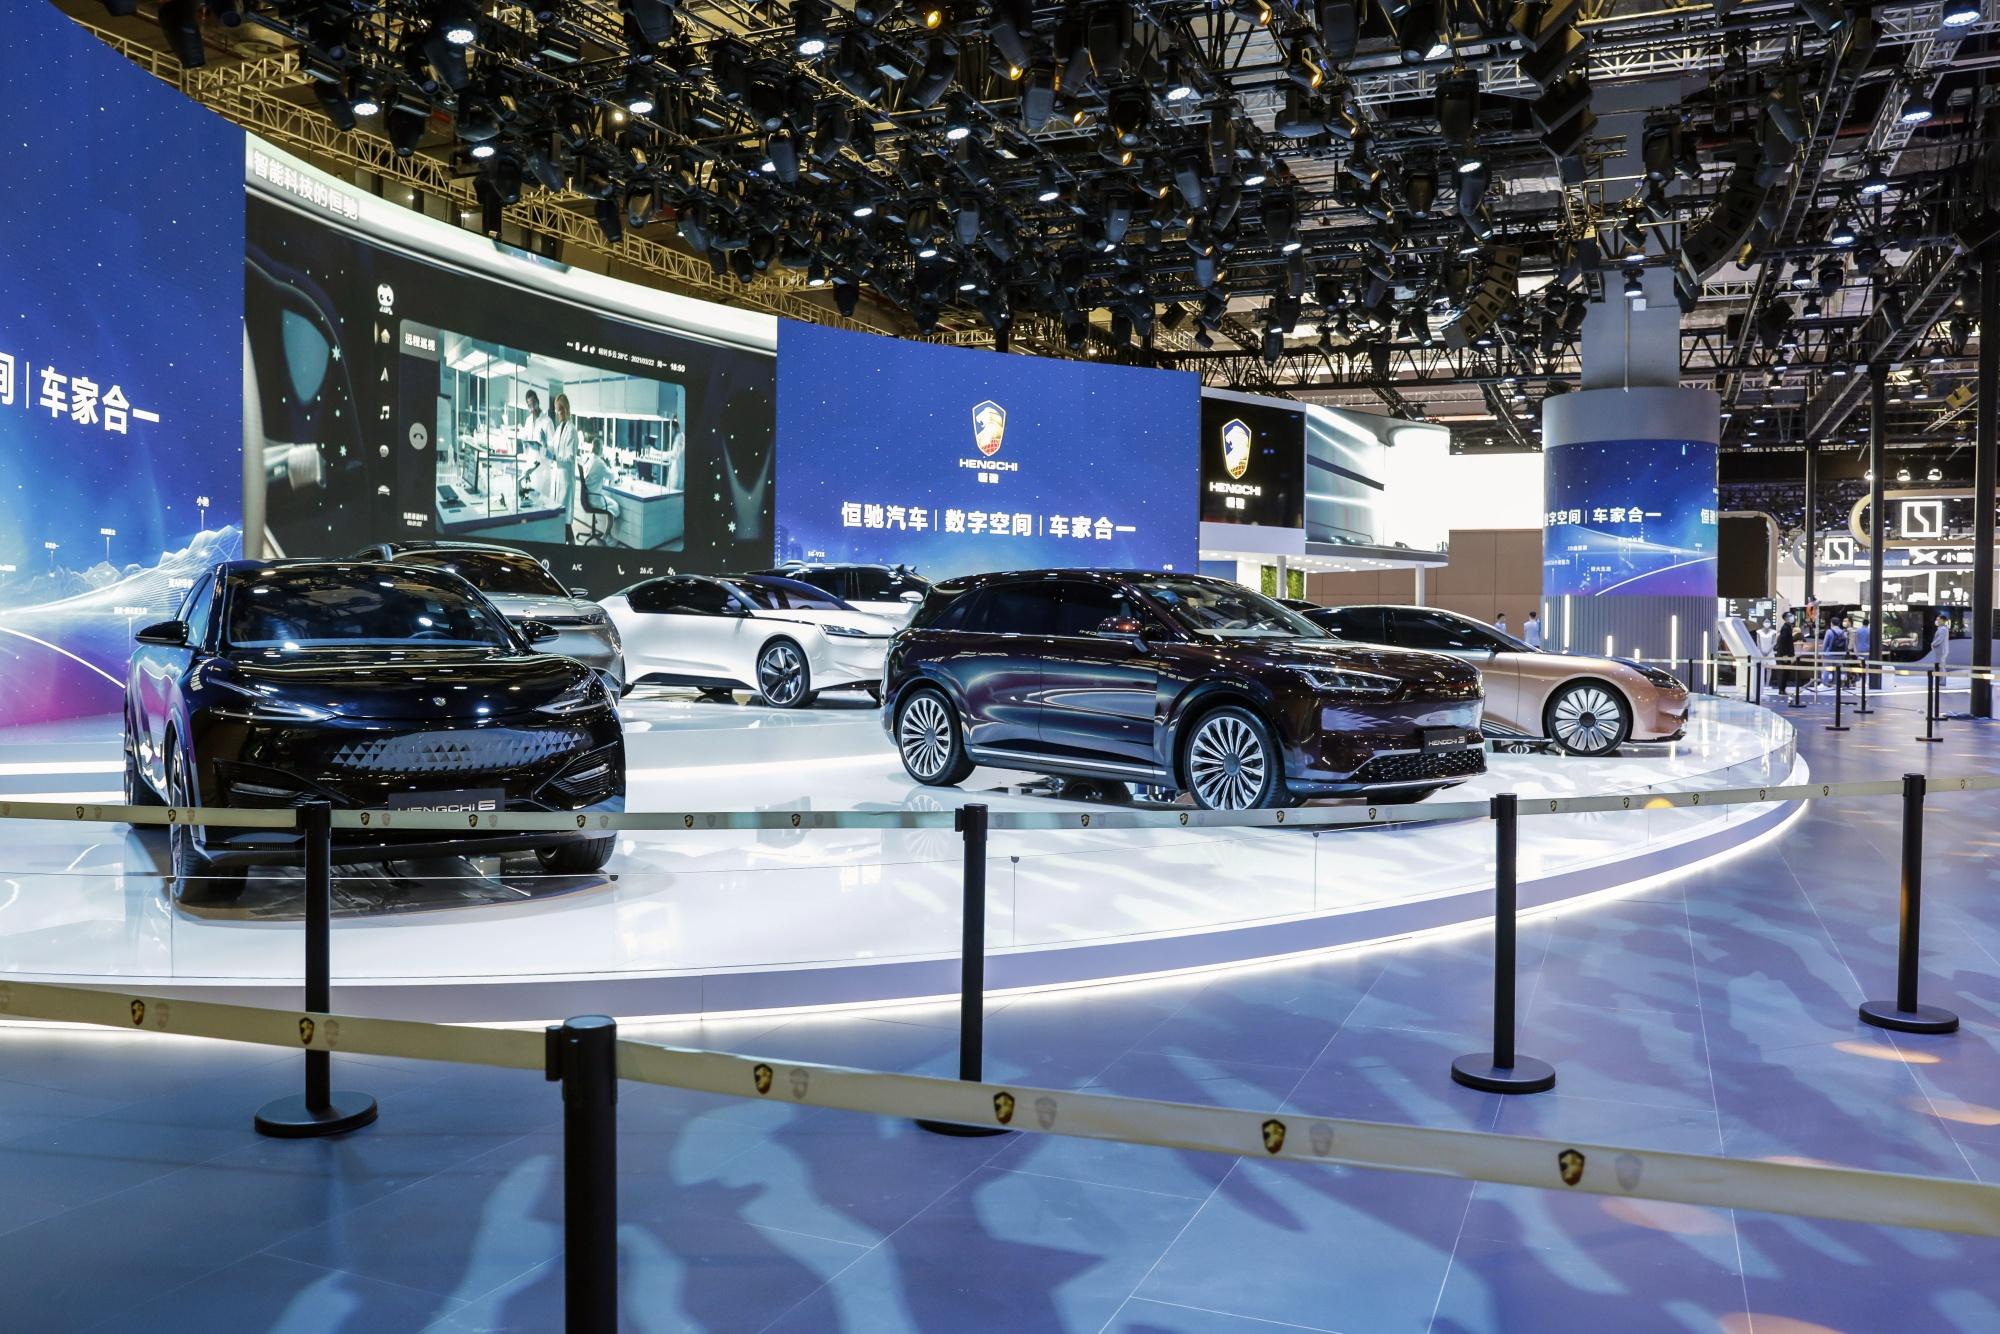 Inside the Shanghai Auto Show